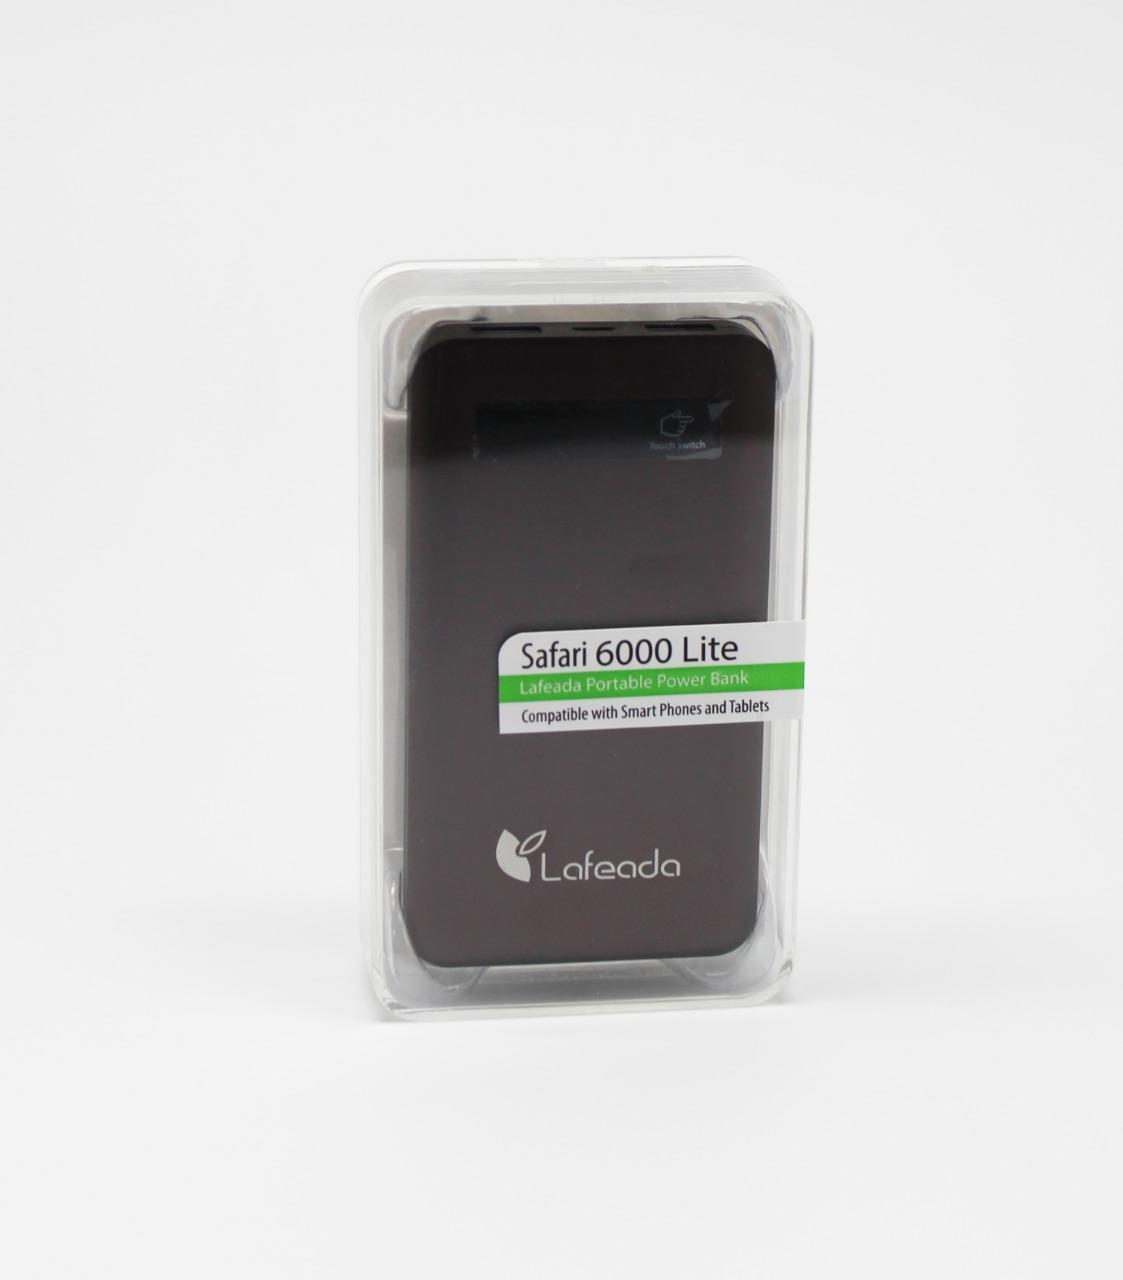 Wholesale power pack : safari 6000 lite, brown, universal power bank